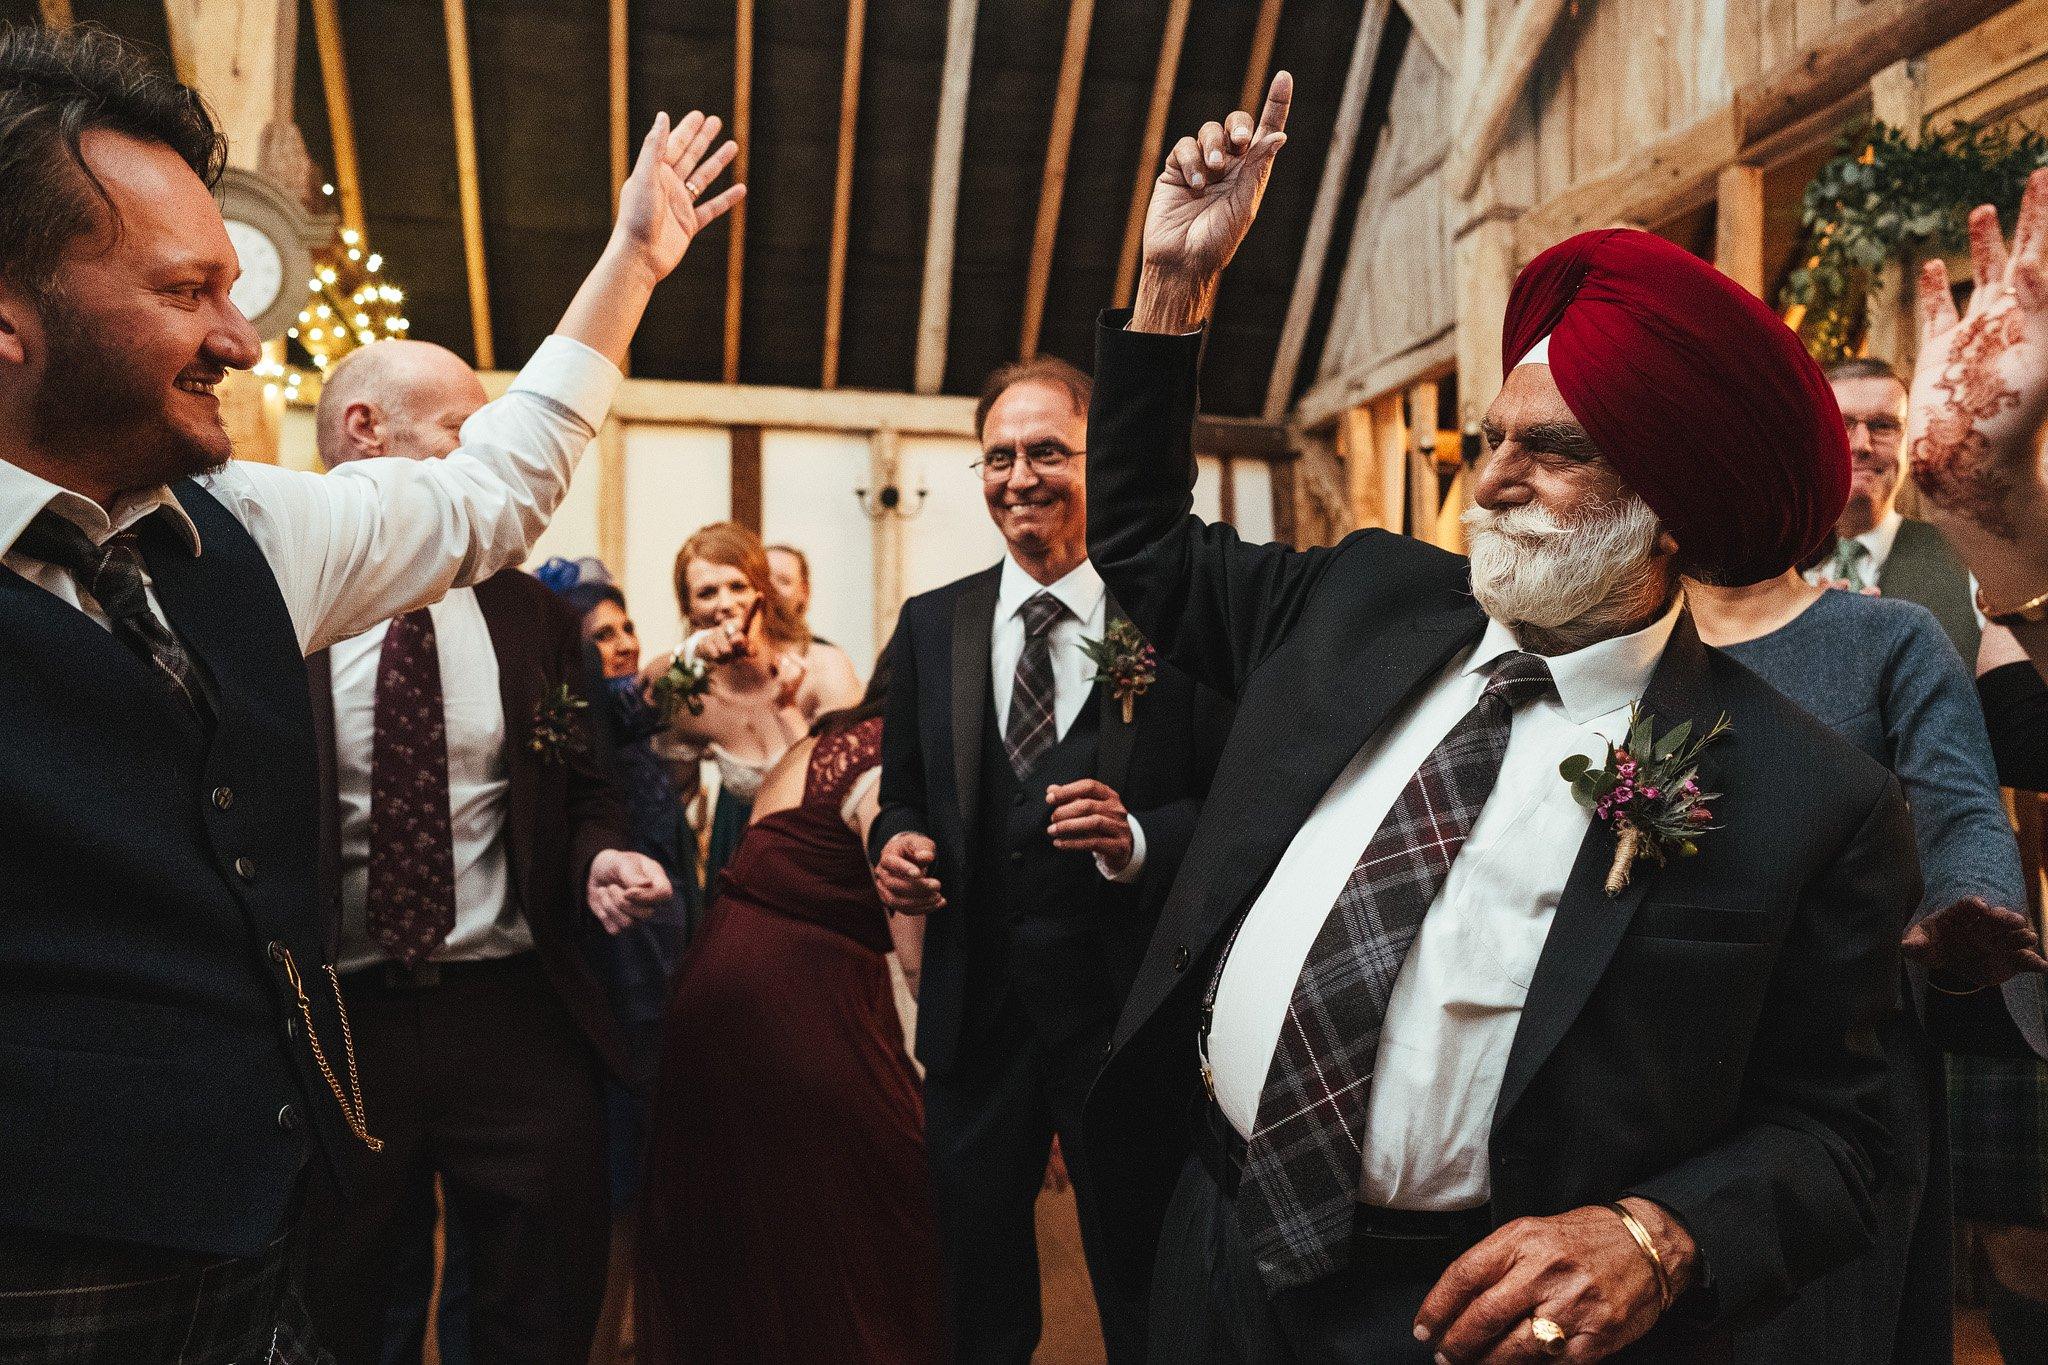 Wedding Photographer Of The Year 2020028